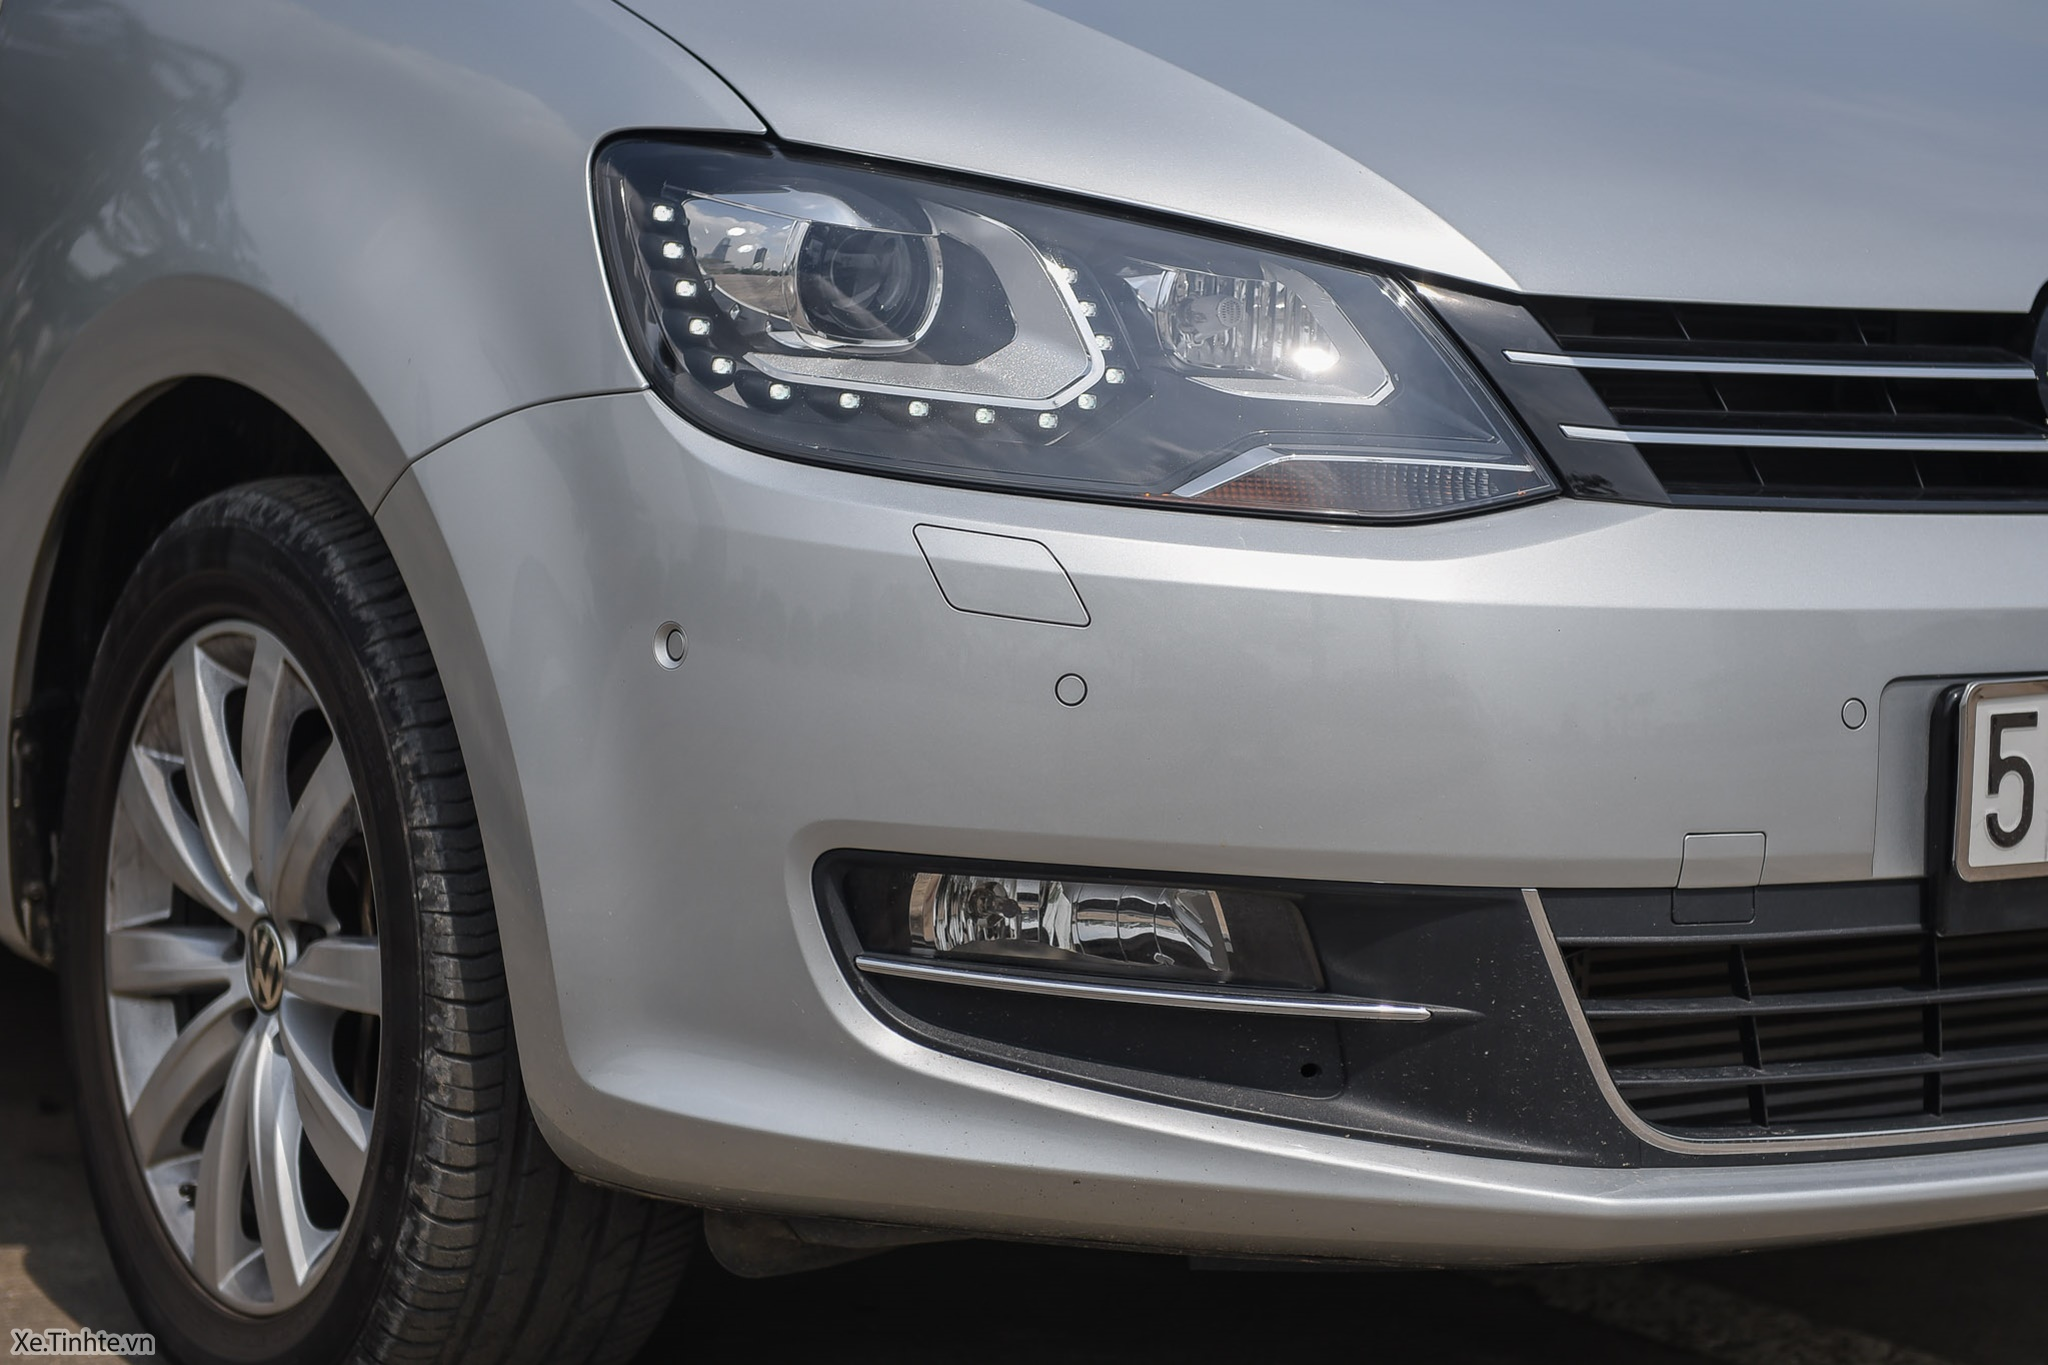 Volkswagen_Sharan_Xe_Tinhte_100.jpg